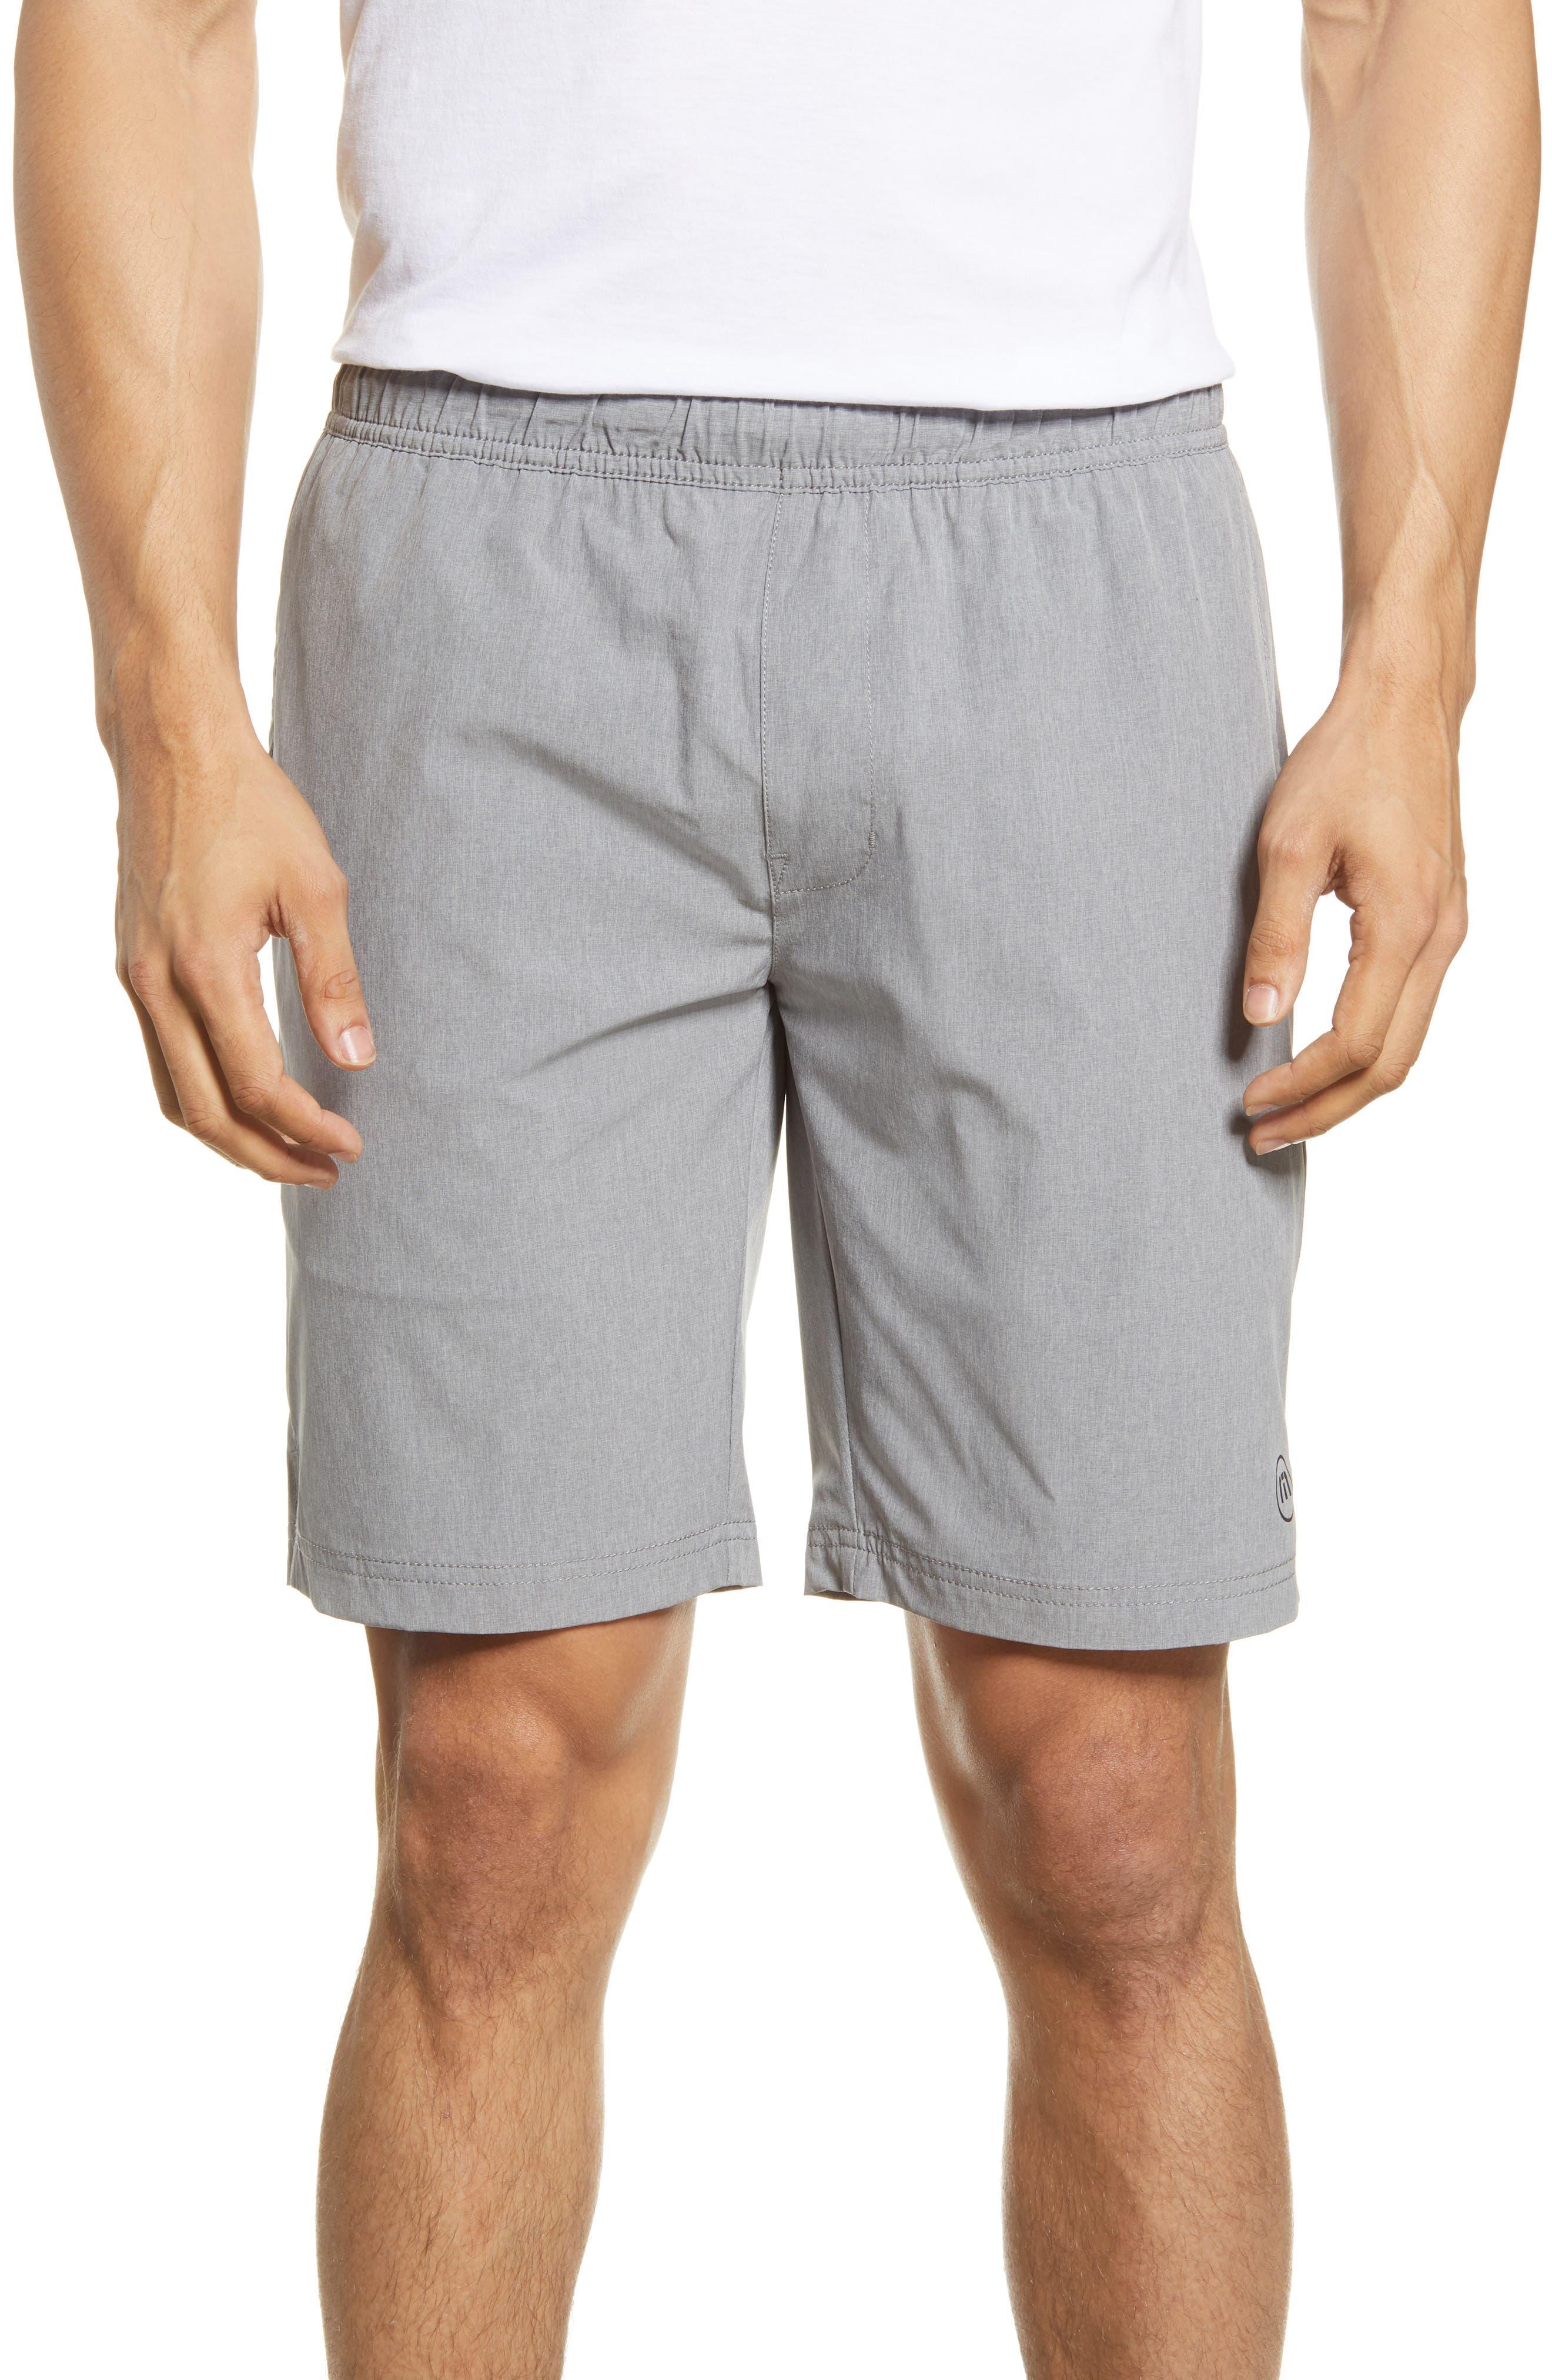 Image of TRAVIS MATHEW Bellie Knit Shorts